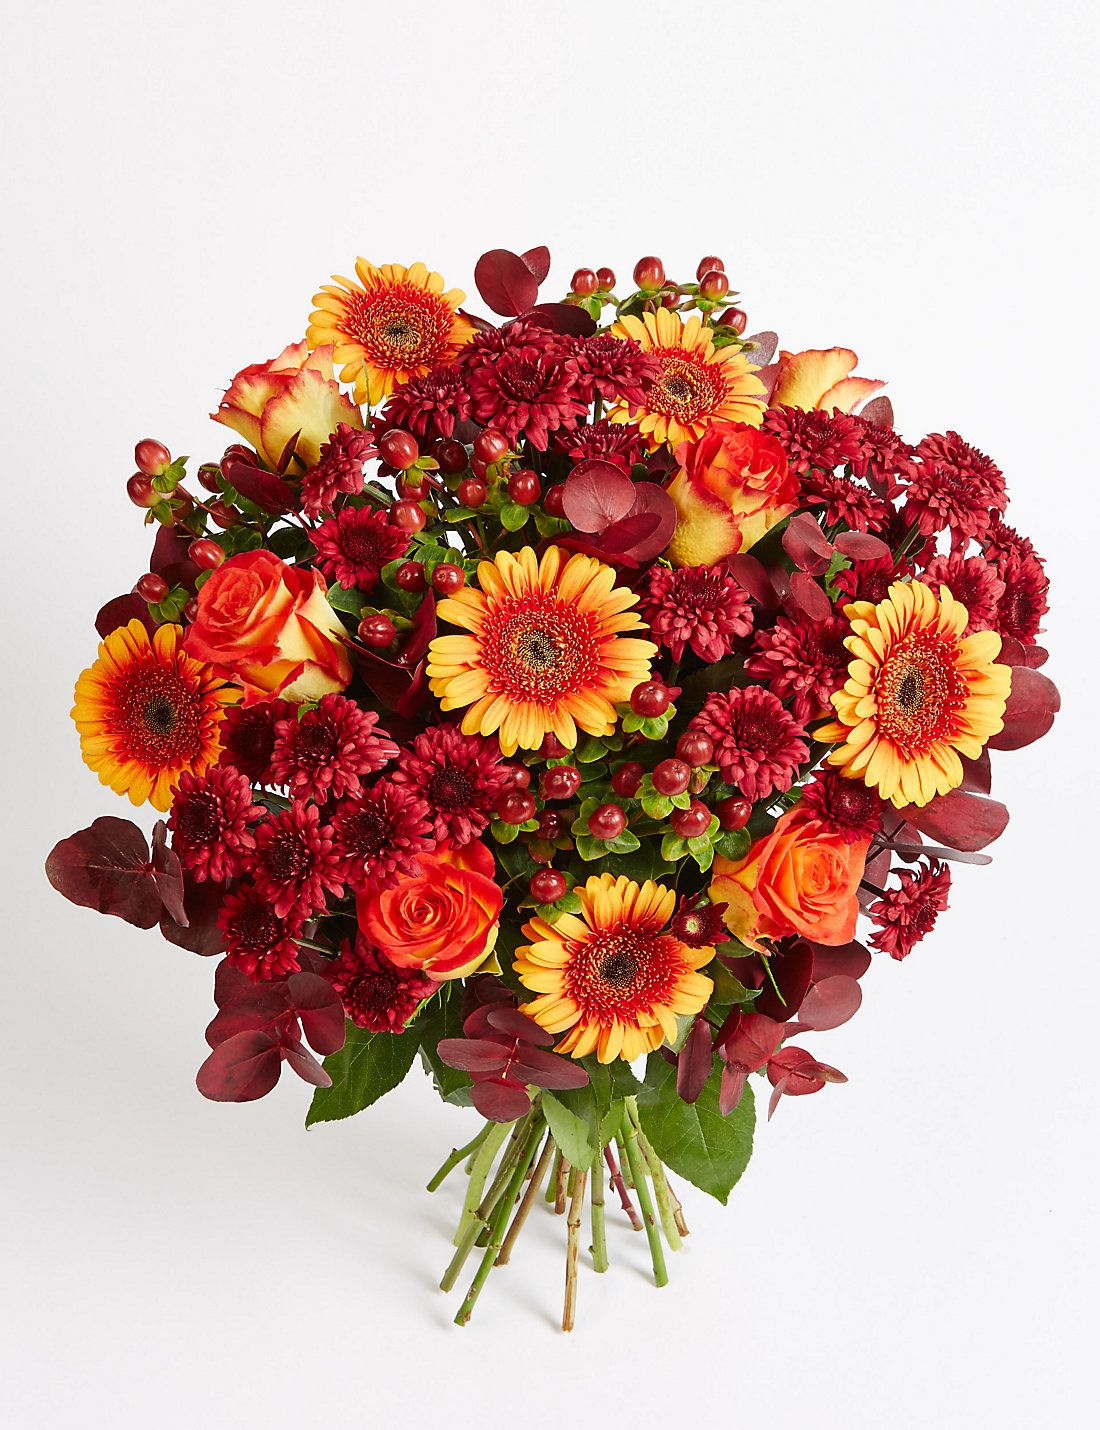 Pin by C. B. on Flowers Fresh flowers online, Fresh